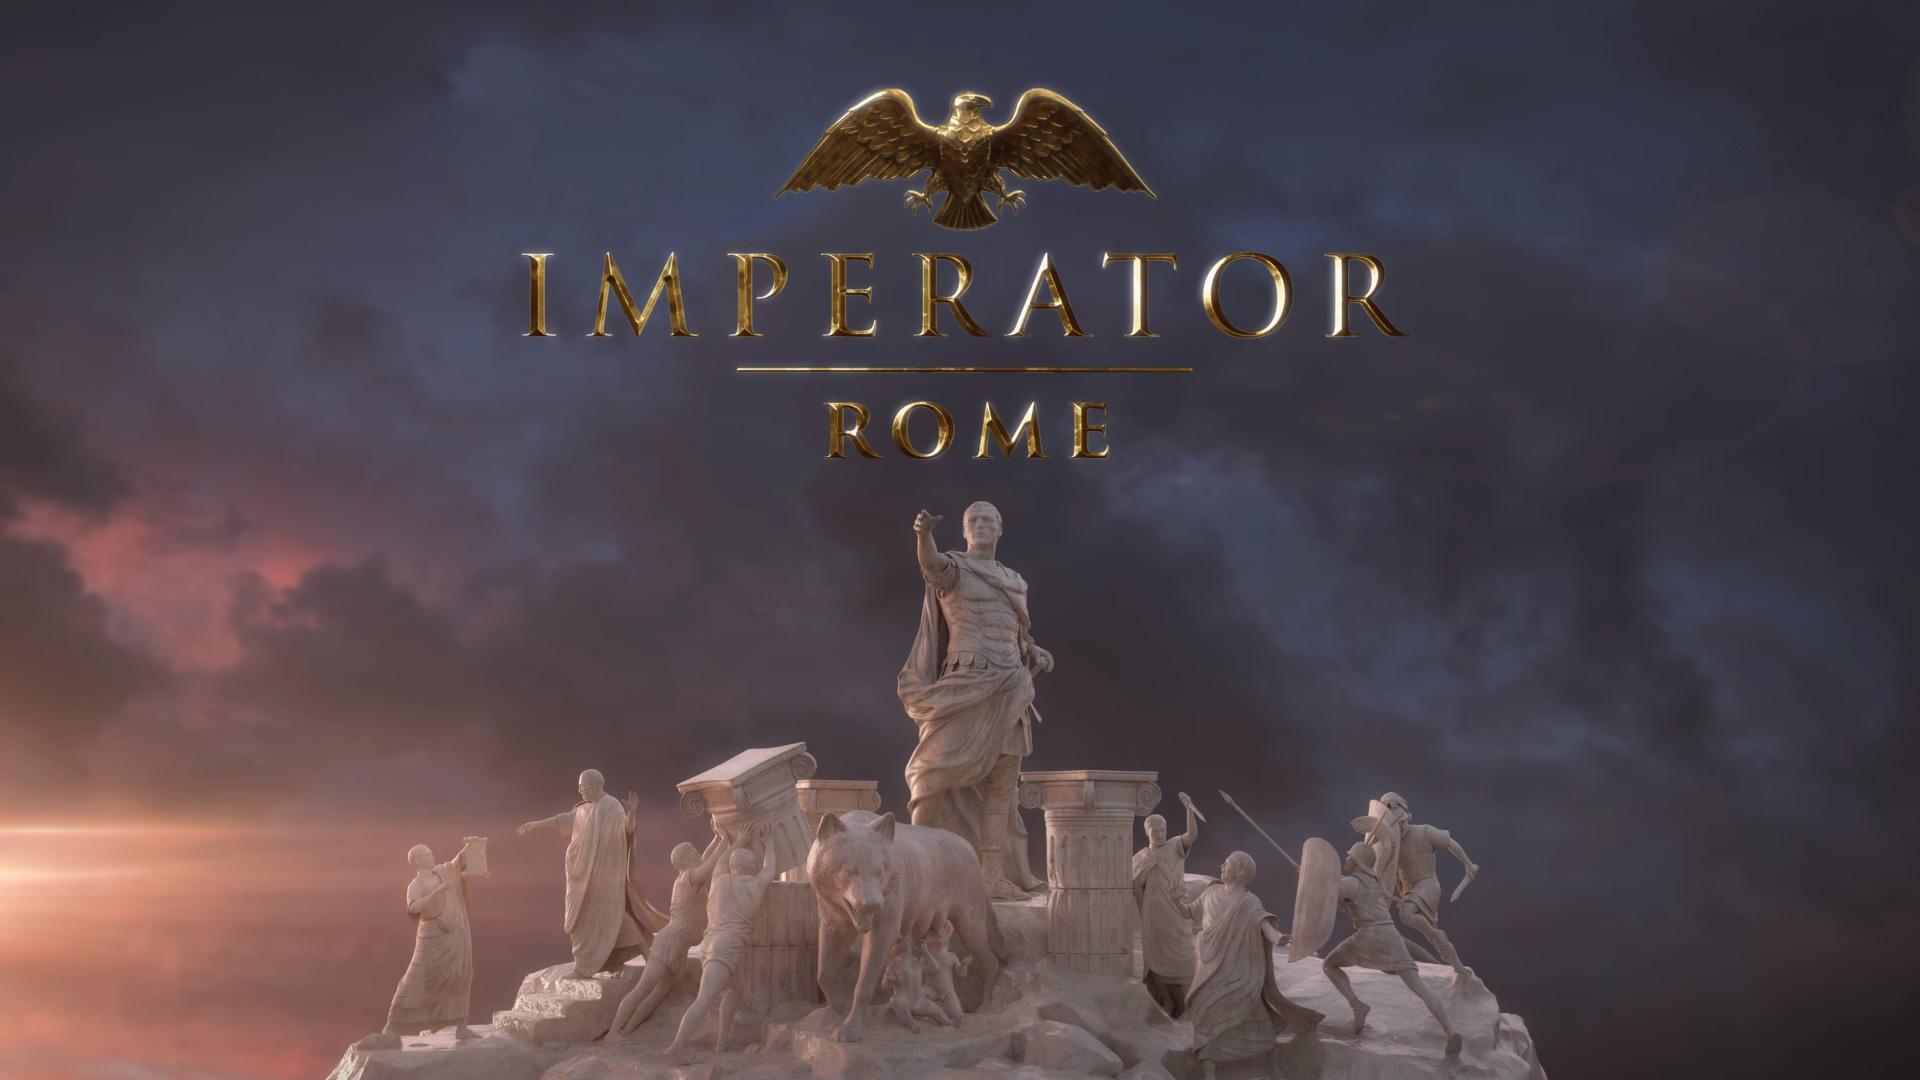 Imperator Rome iOS/APK Version Full Game Free Download